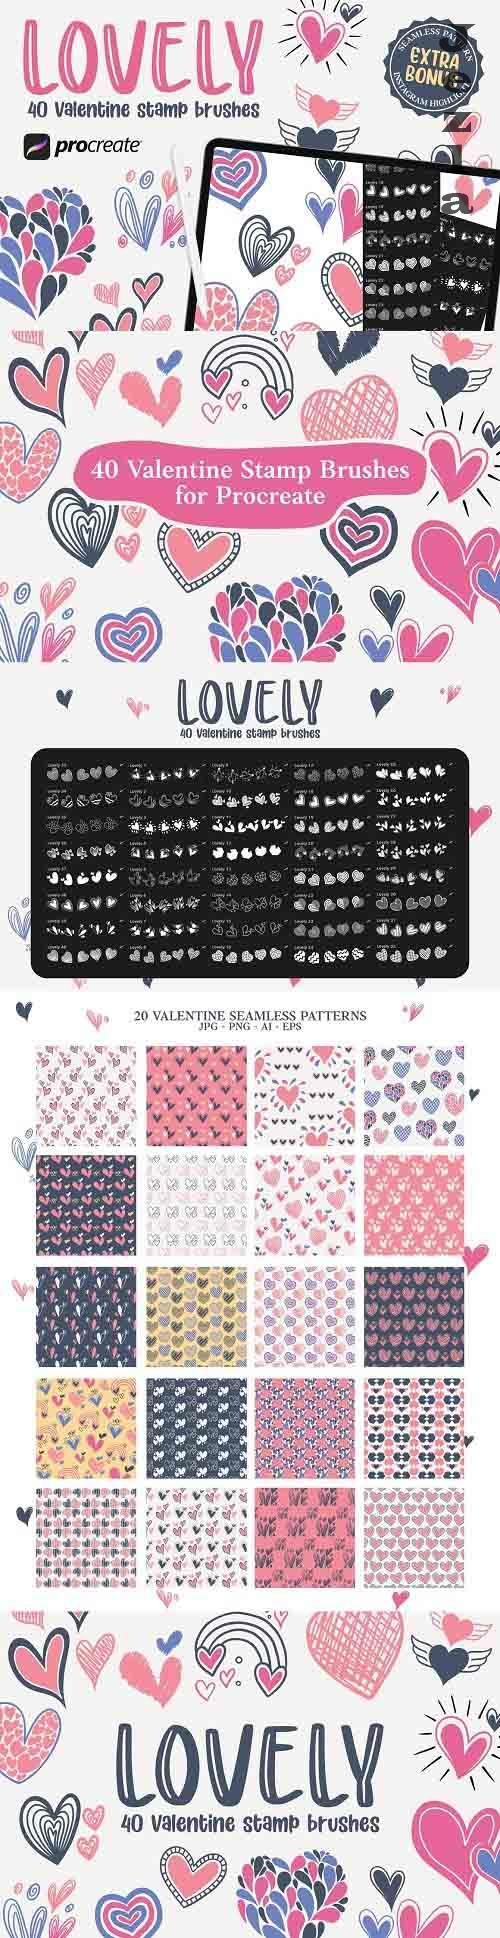 Lovely - 40 Stamp Brush Procreate - 5745380